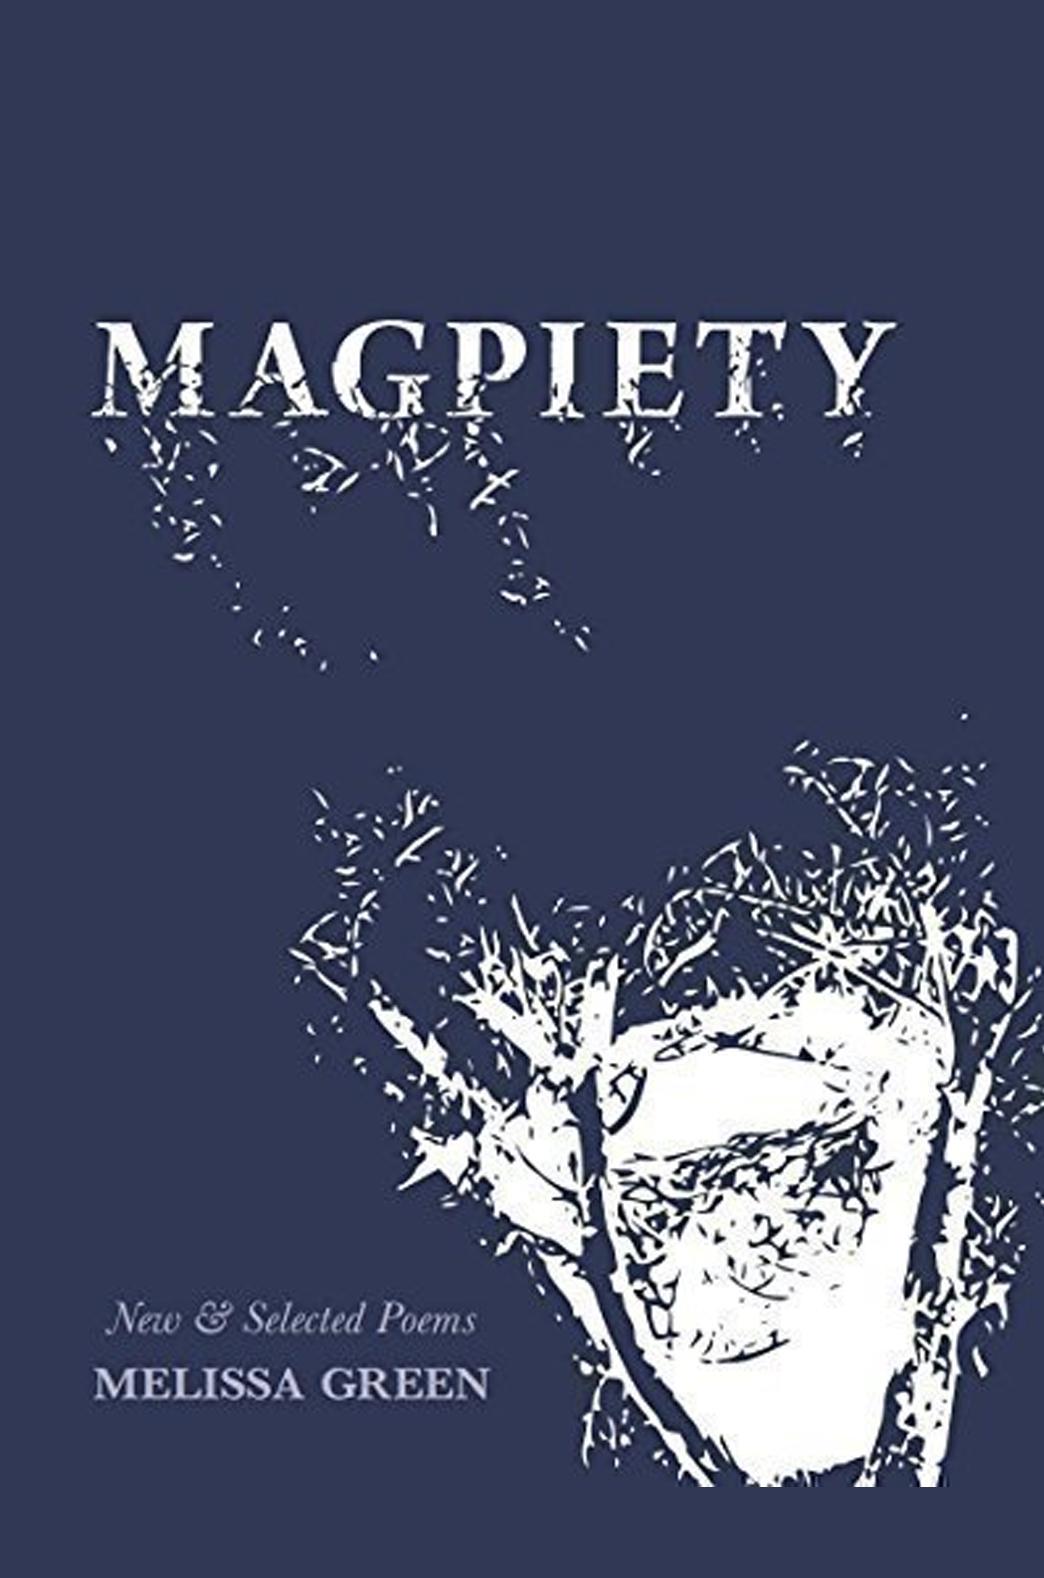 kathleen stone writer booklab literary salon magpiety melissa green